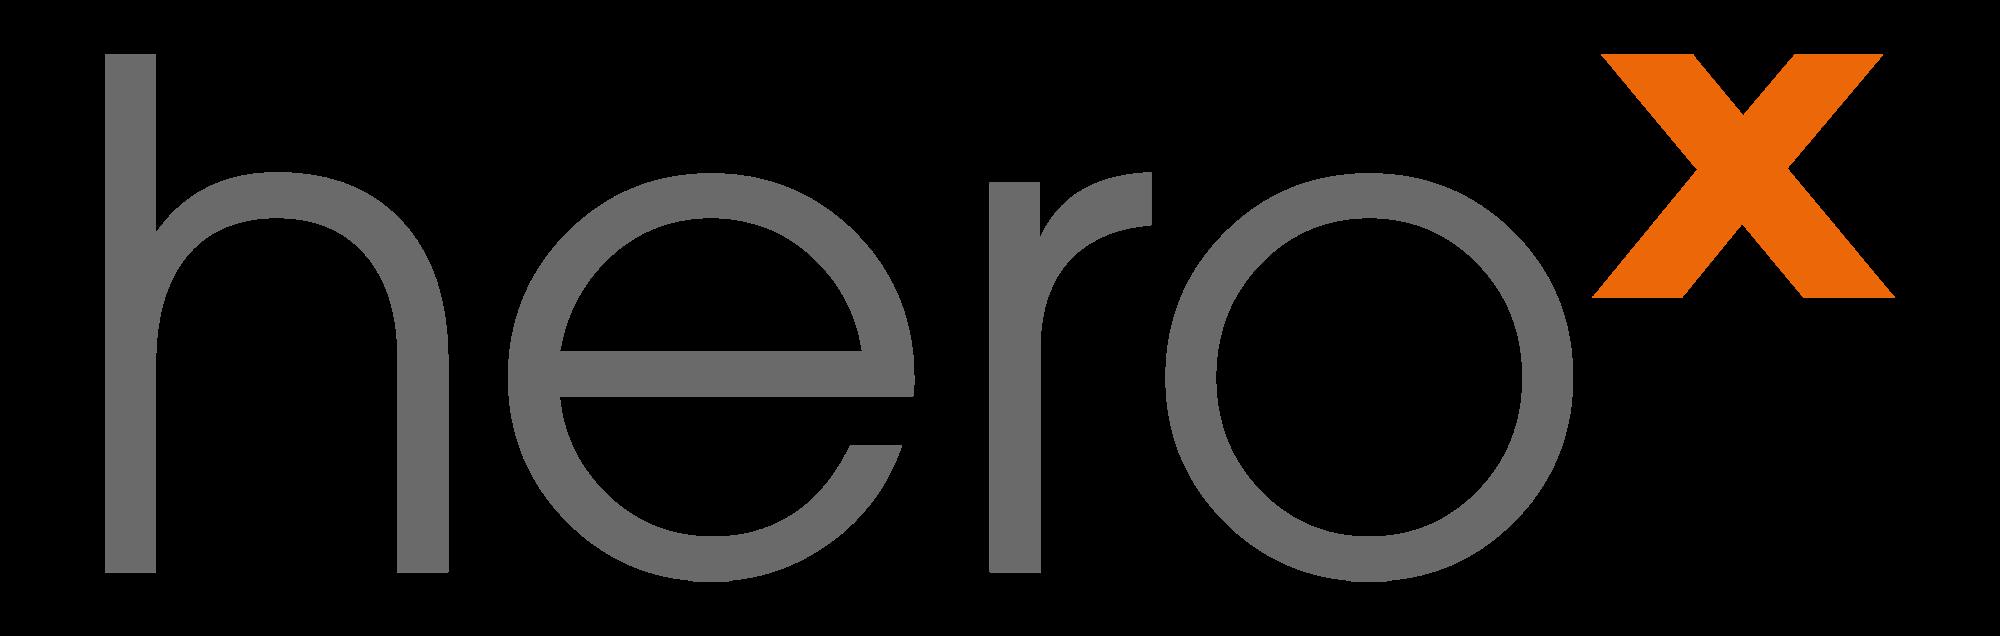 Future Festival Sponsor HeroX